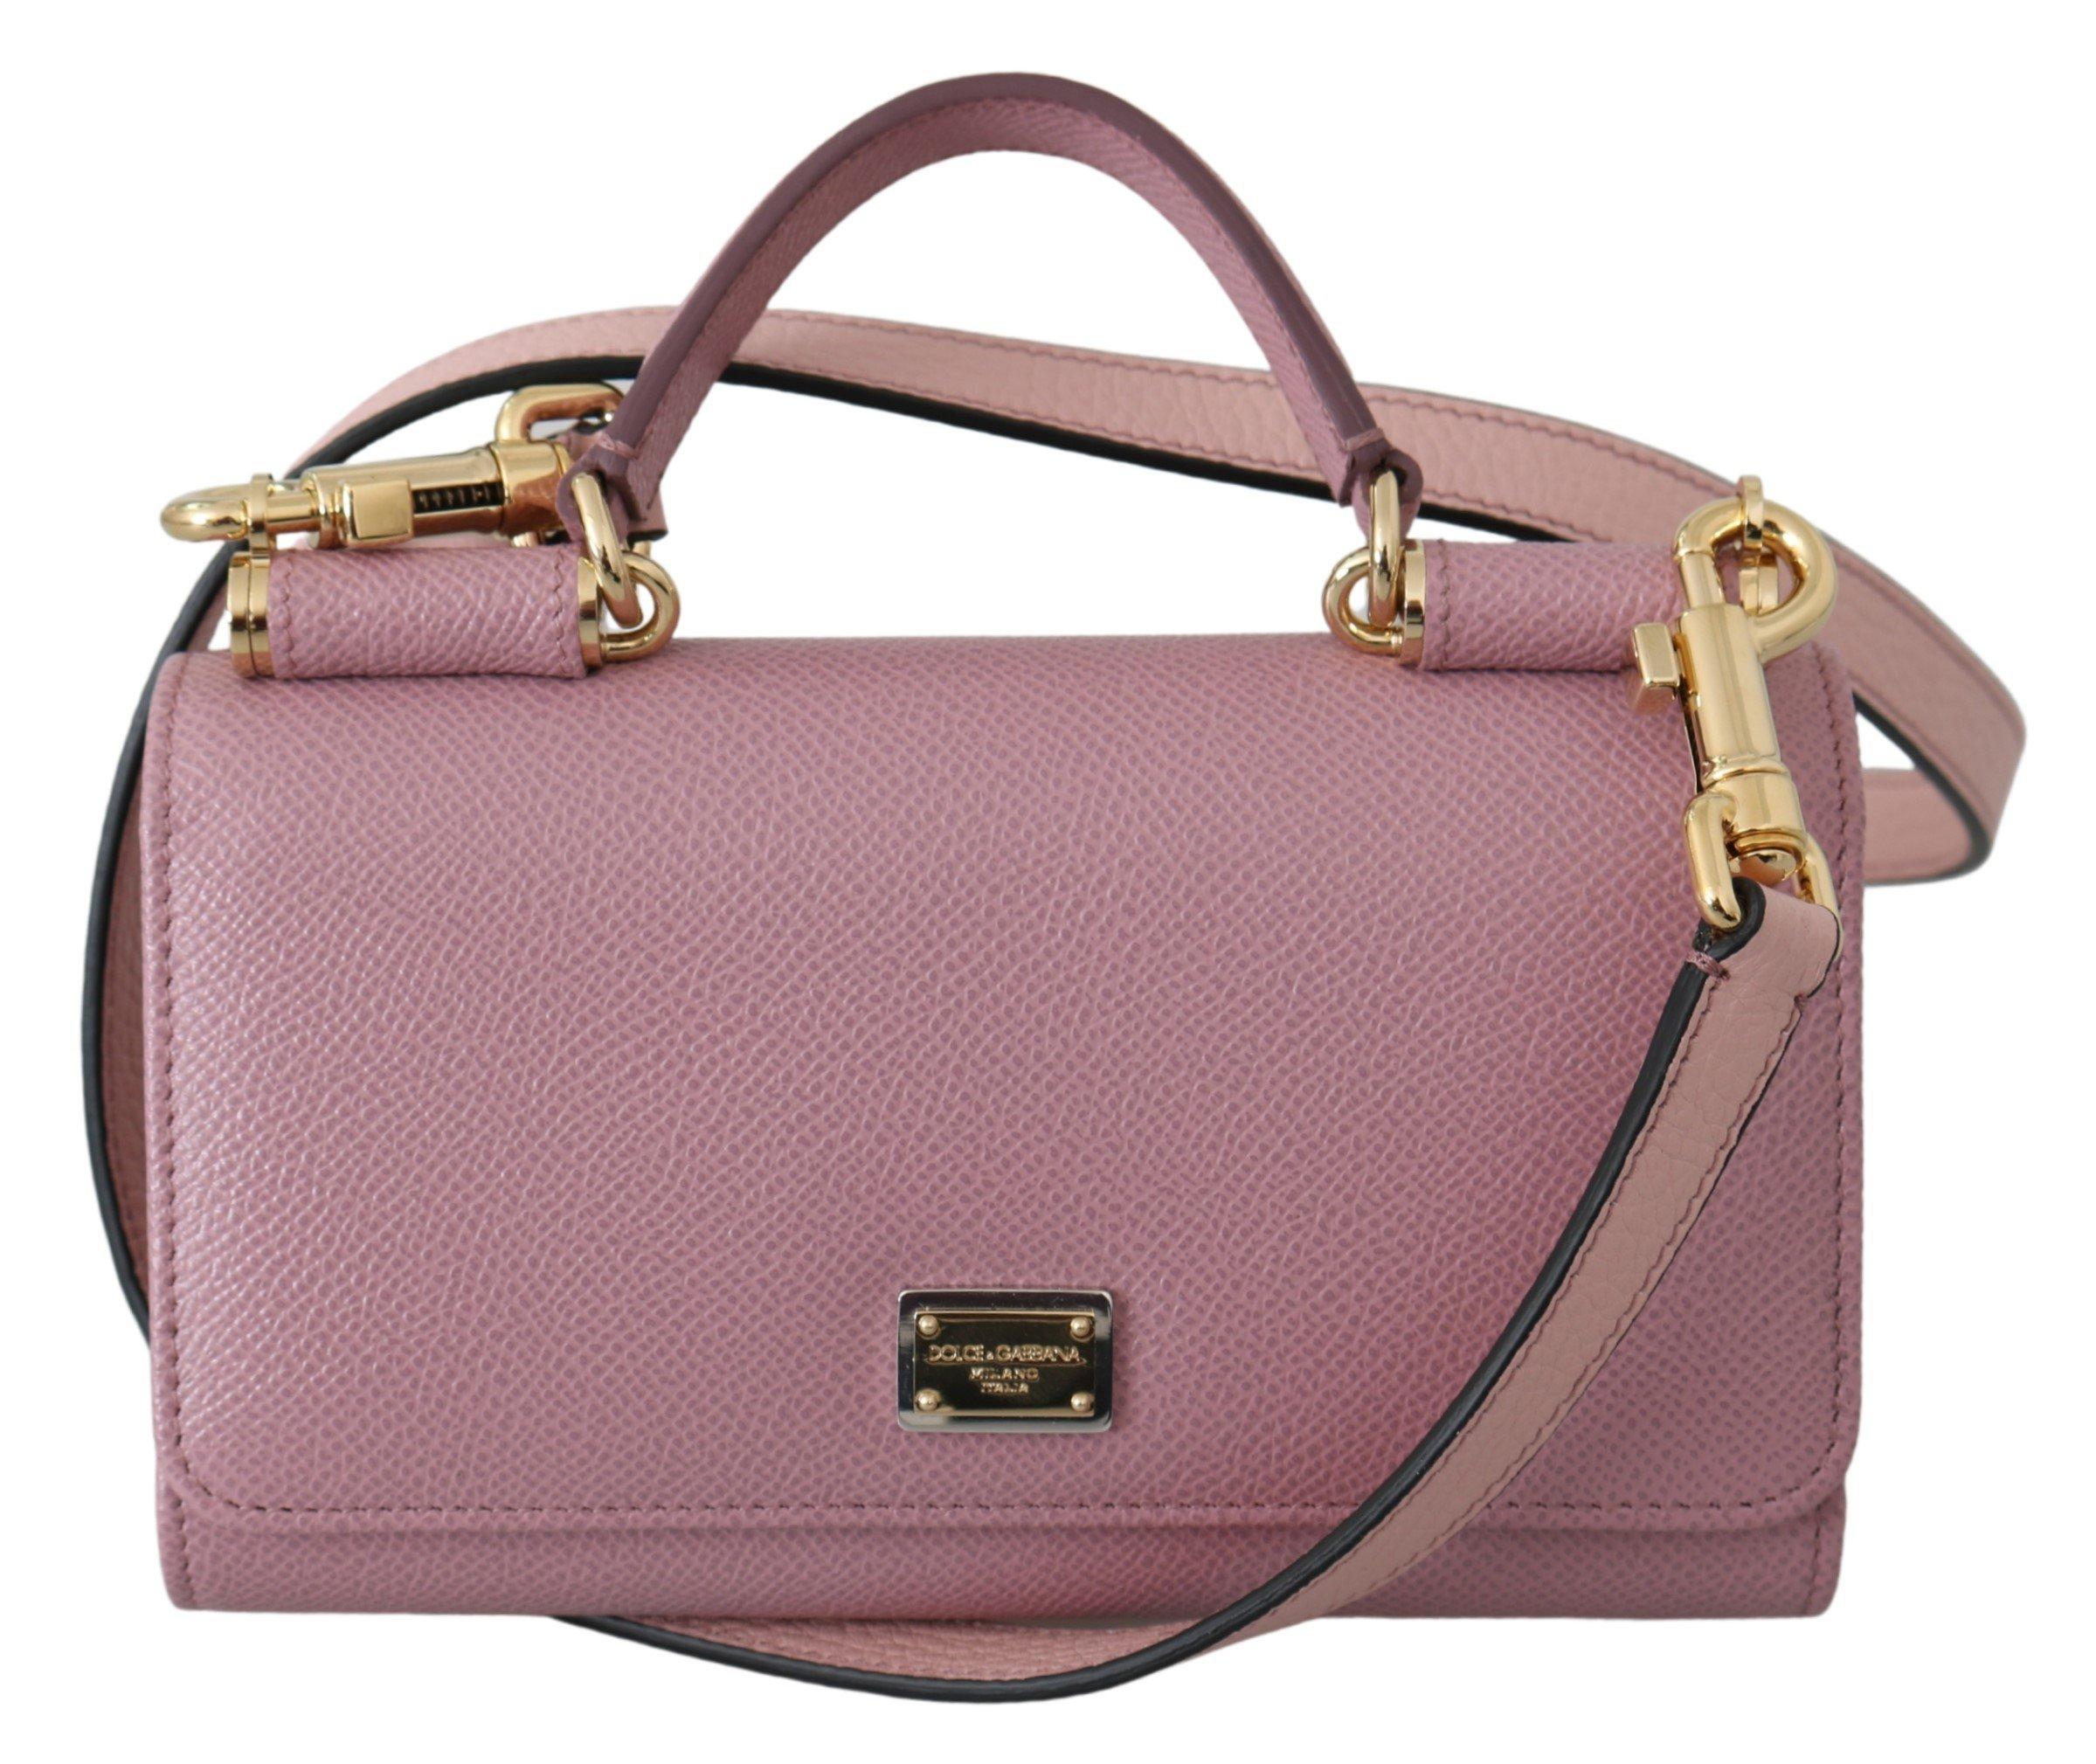 Dolce & Gabbana Women's Dauphine Leather Sicily Crossbody Bag Pink VAS9873